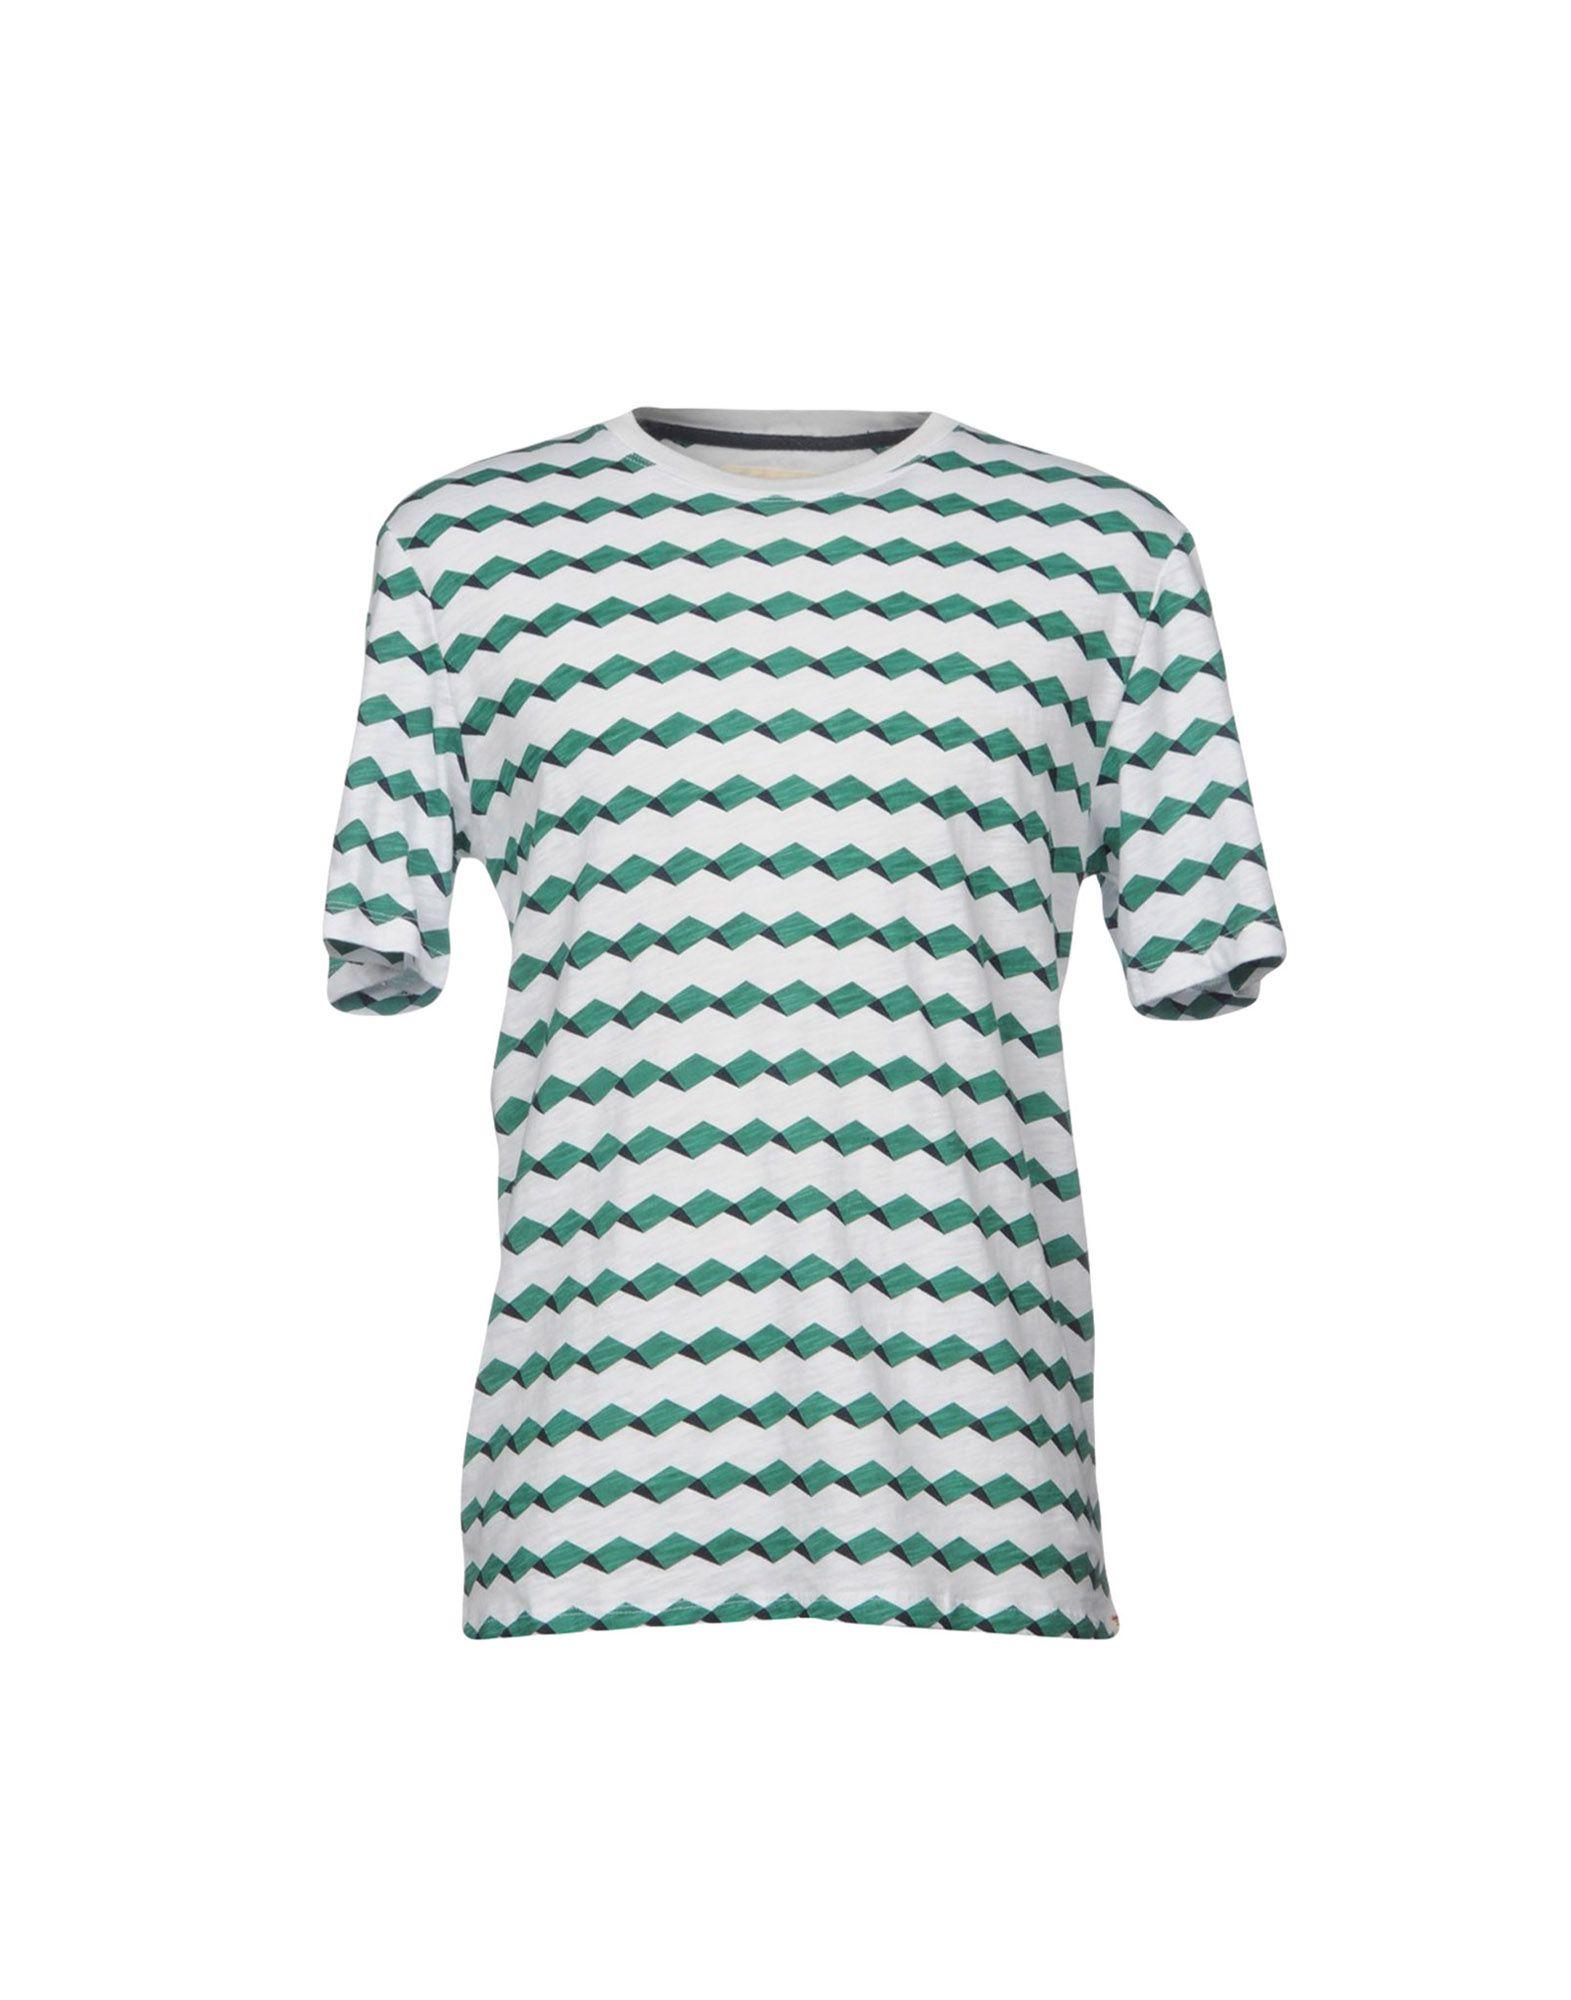 HYMN Herren T-shirts Farbe Grün Größe 6